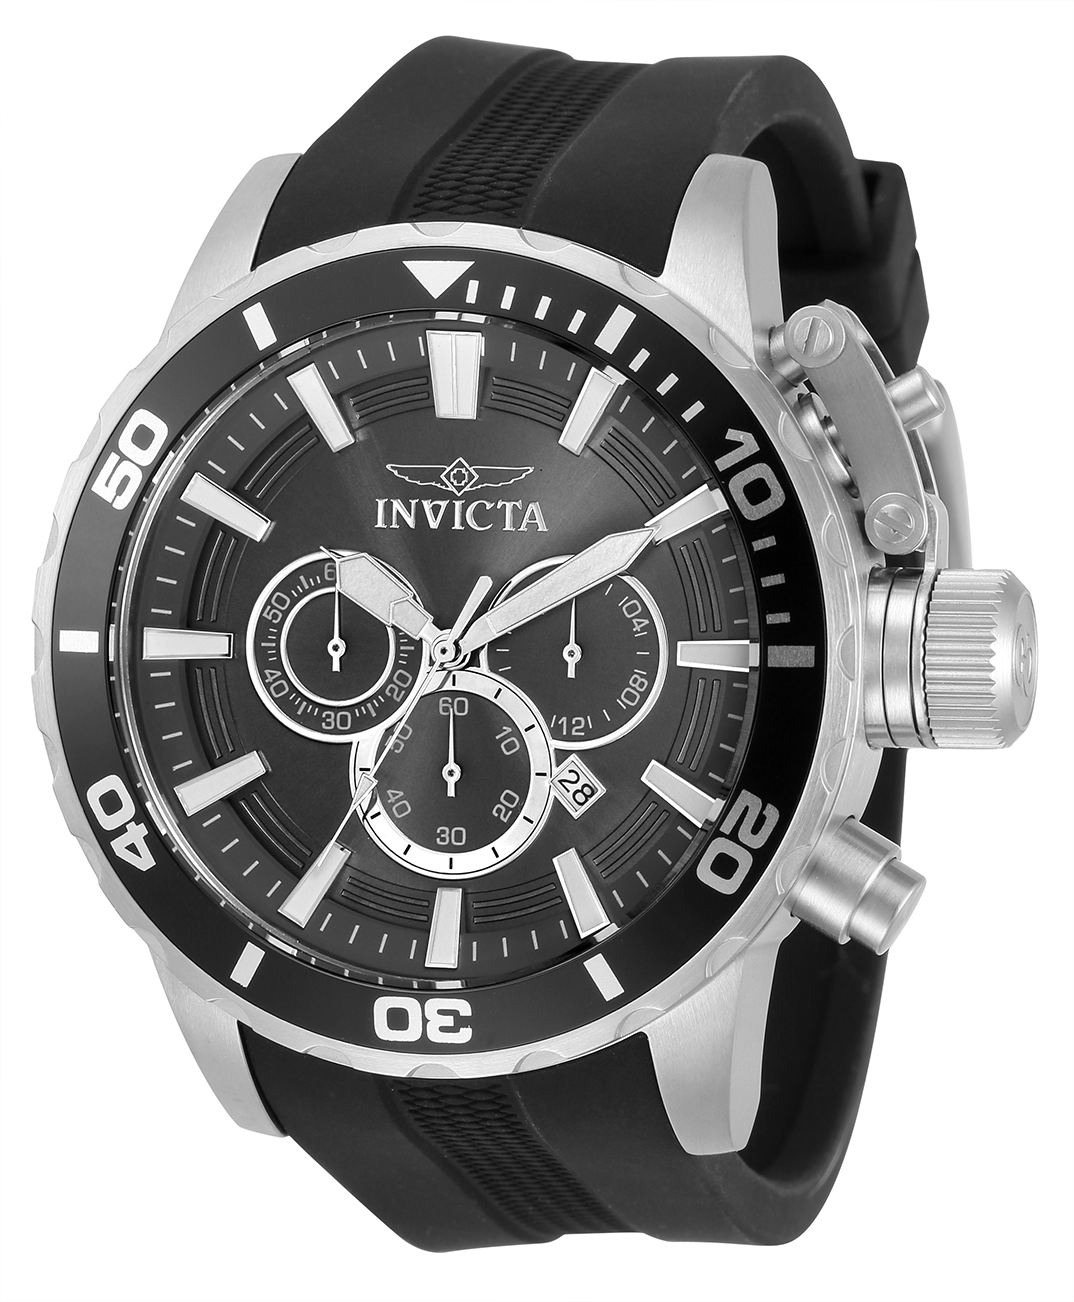 Invicta Corduba Quartz Mens Watch - 52mm Stainless Steel Case, SS/Polyurethane Band, Black (33698)